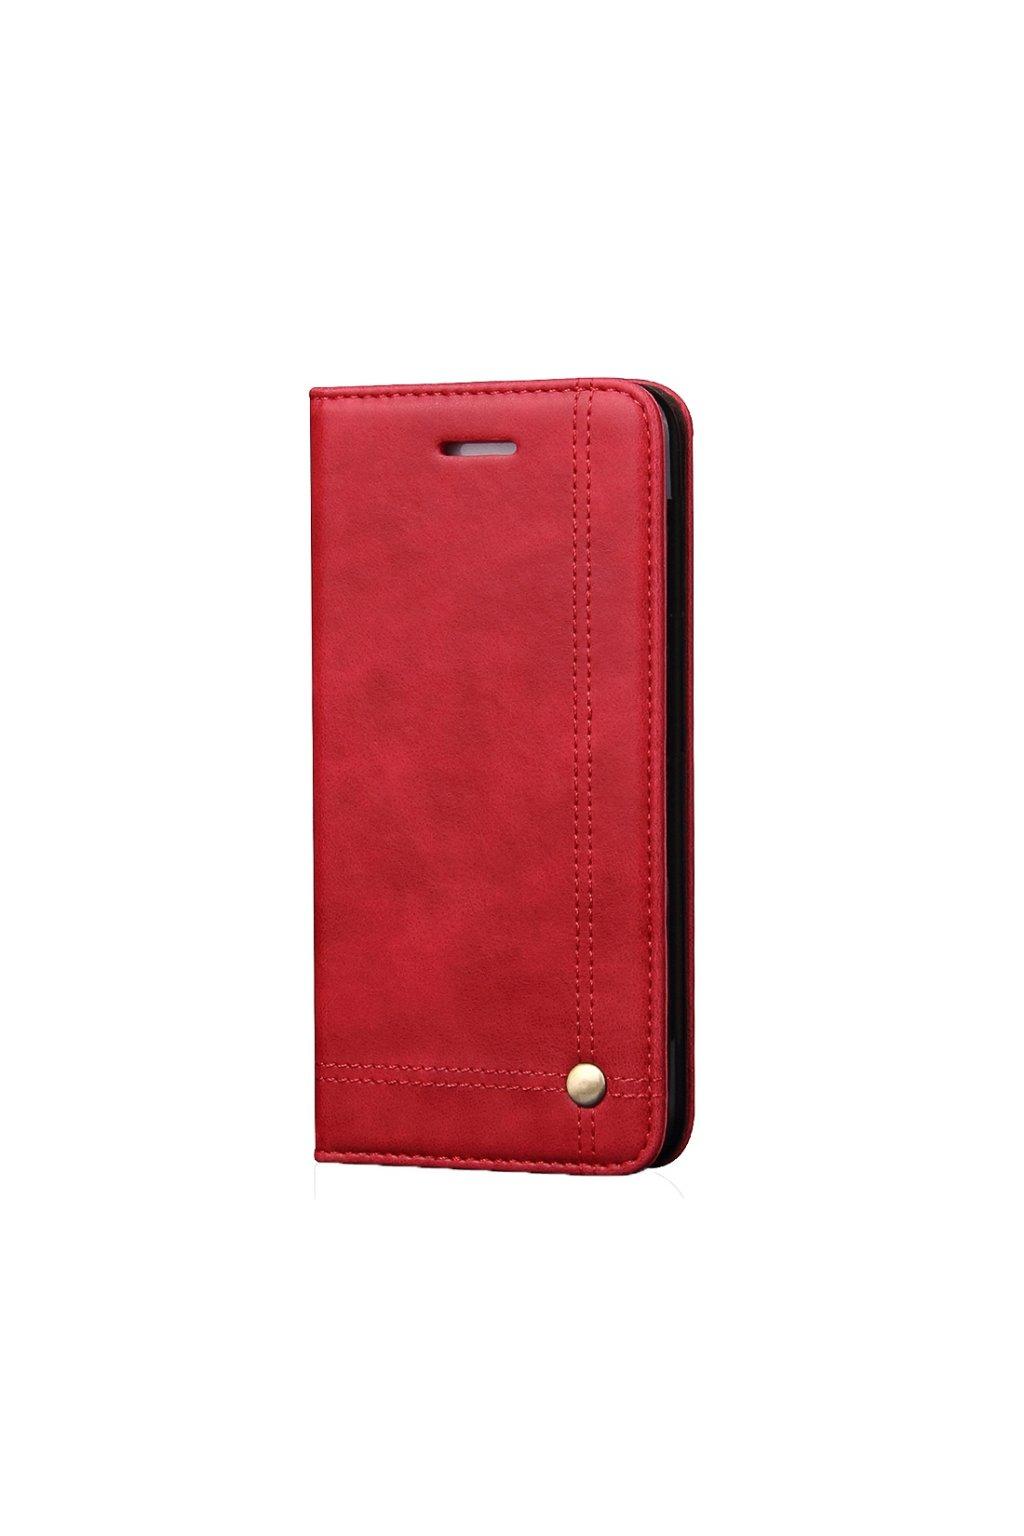 Flipové koženkové pouzdro iPhone 5, 5s, SE Red